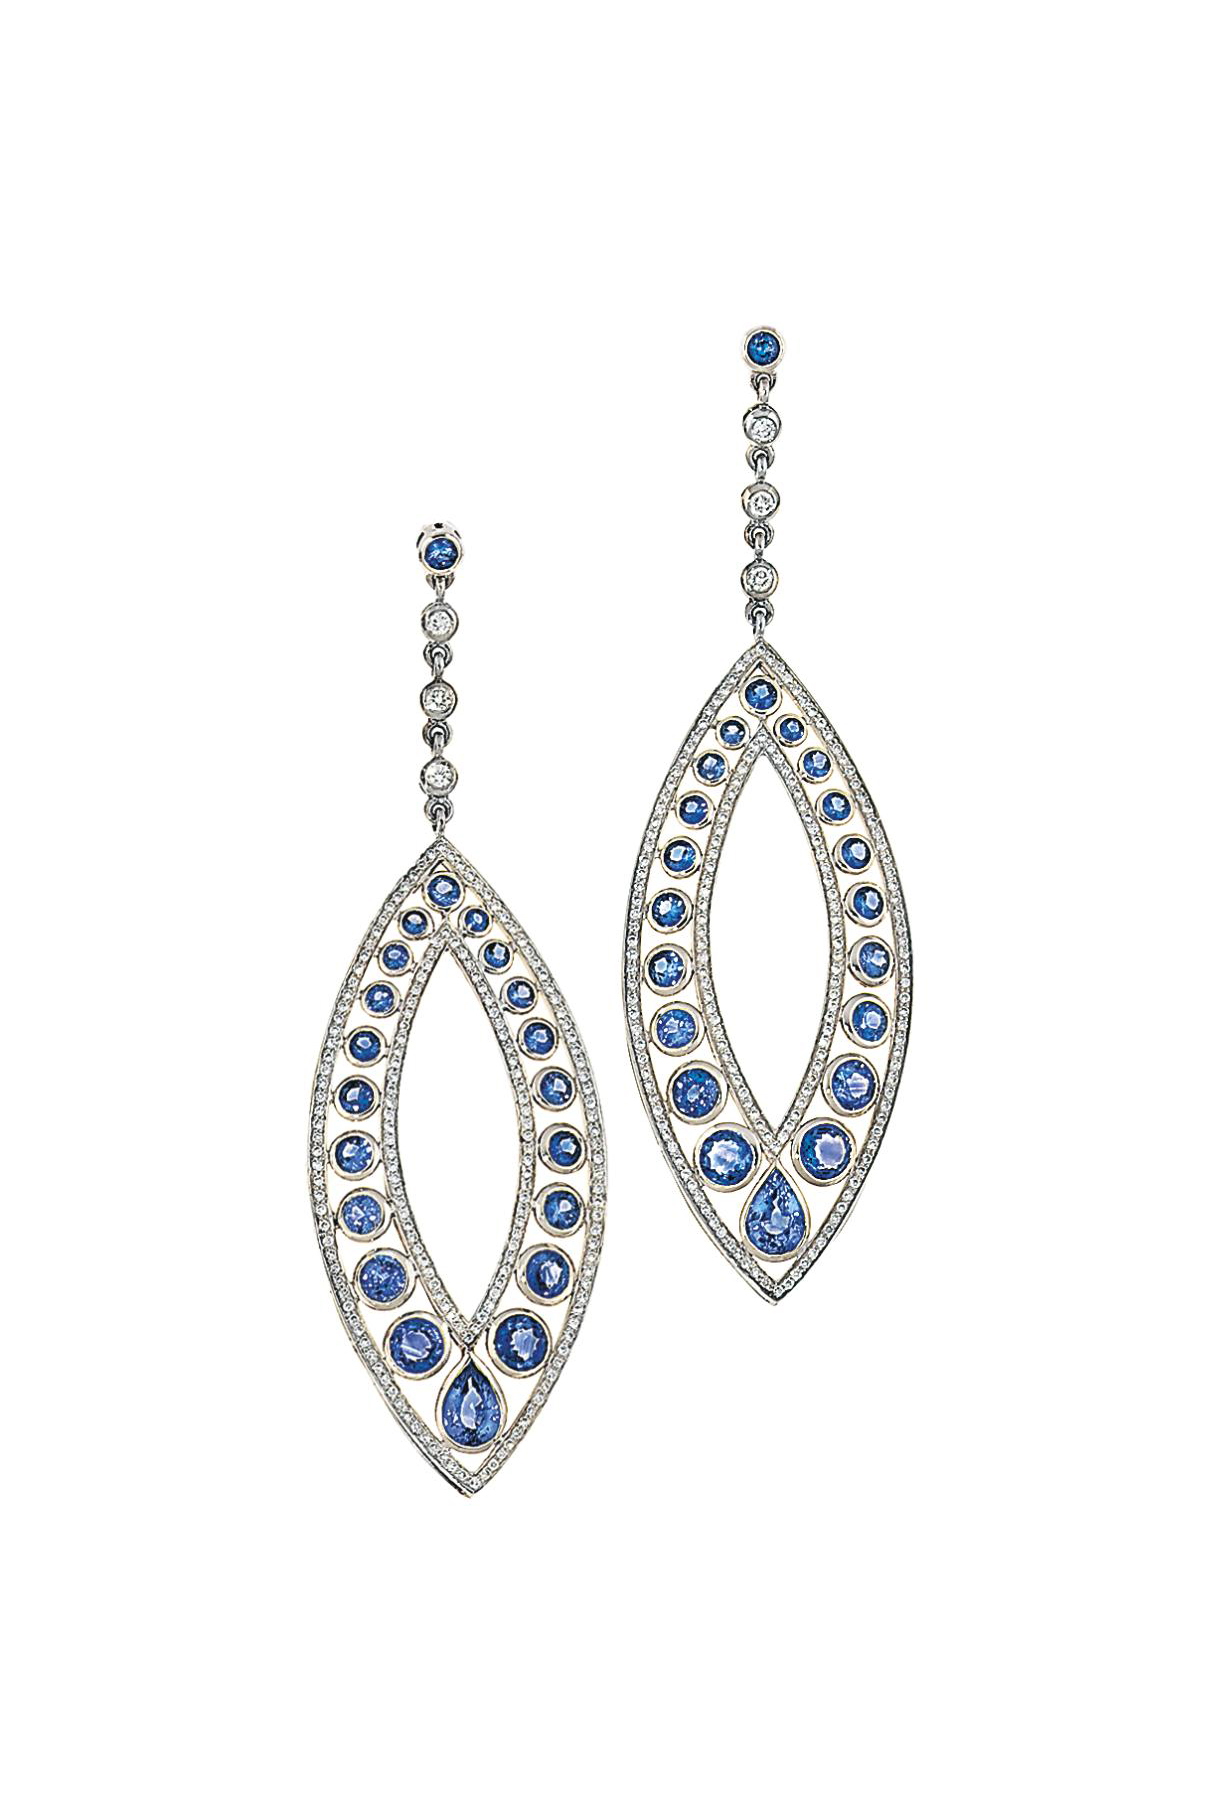 Three pairs of sapphire and di